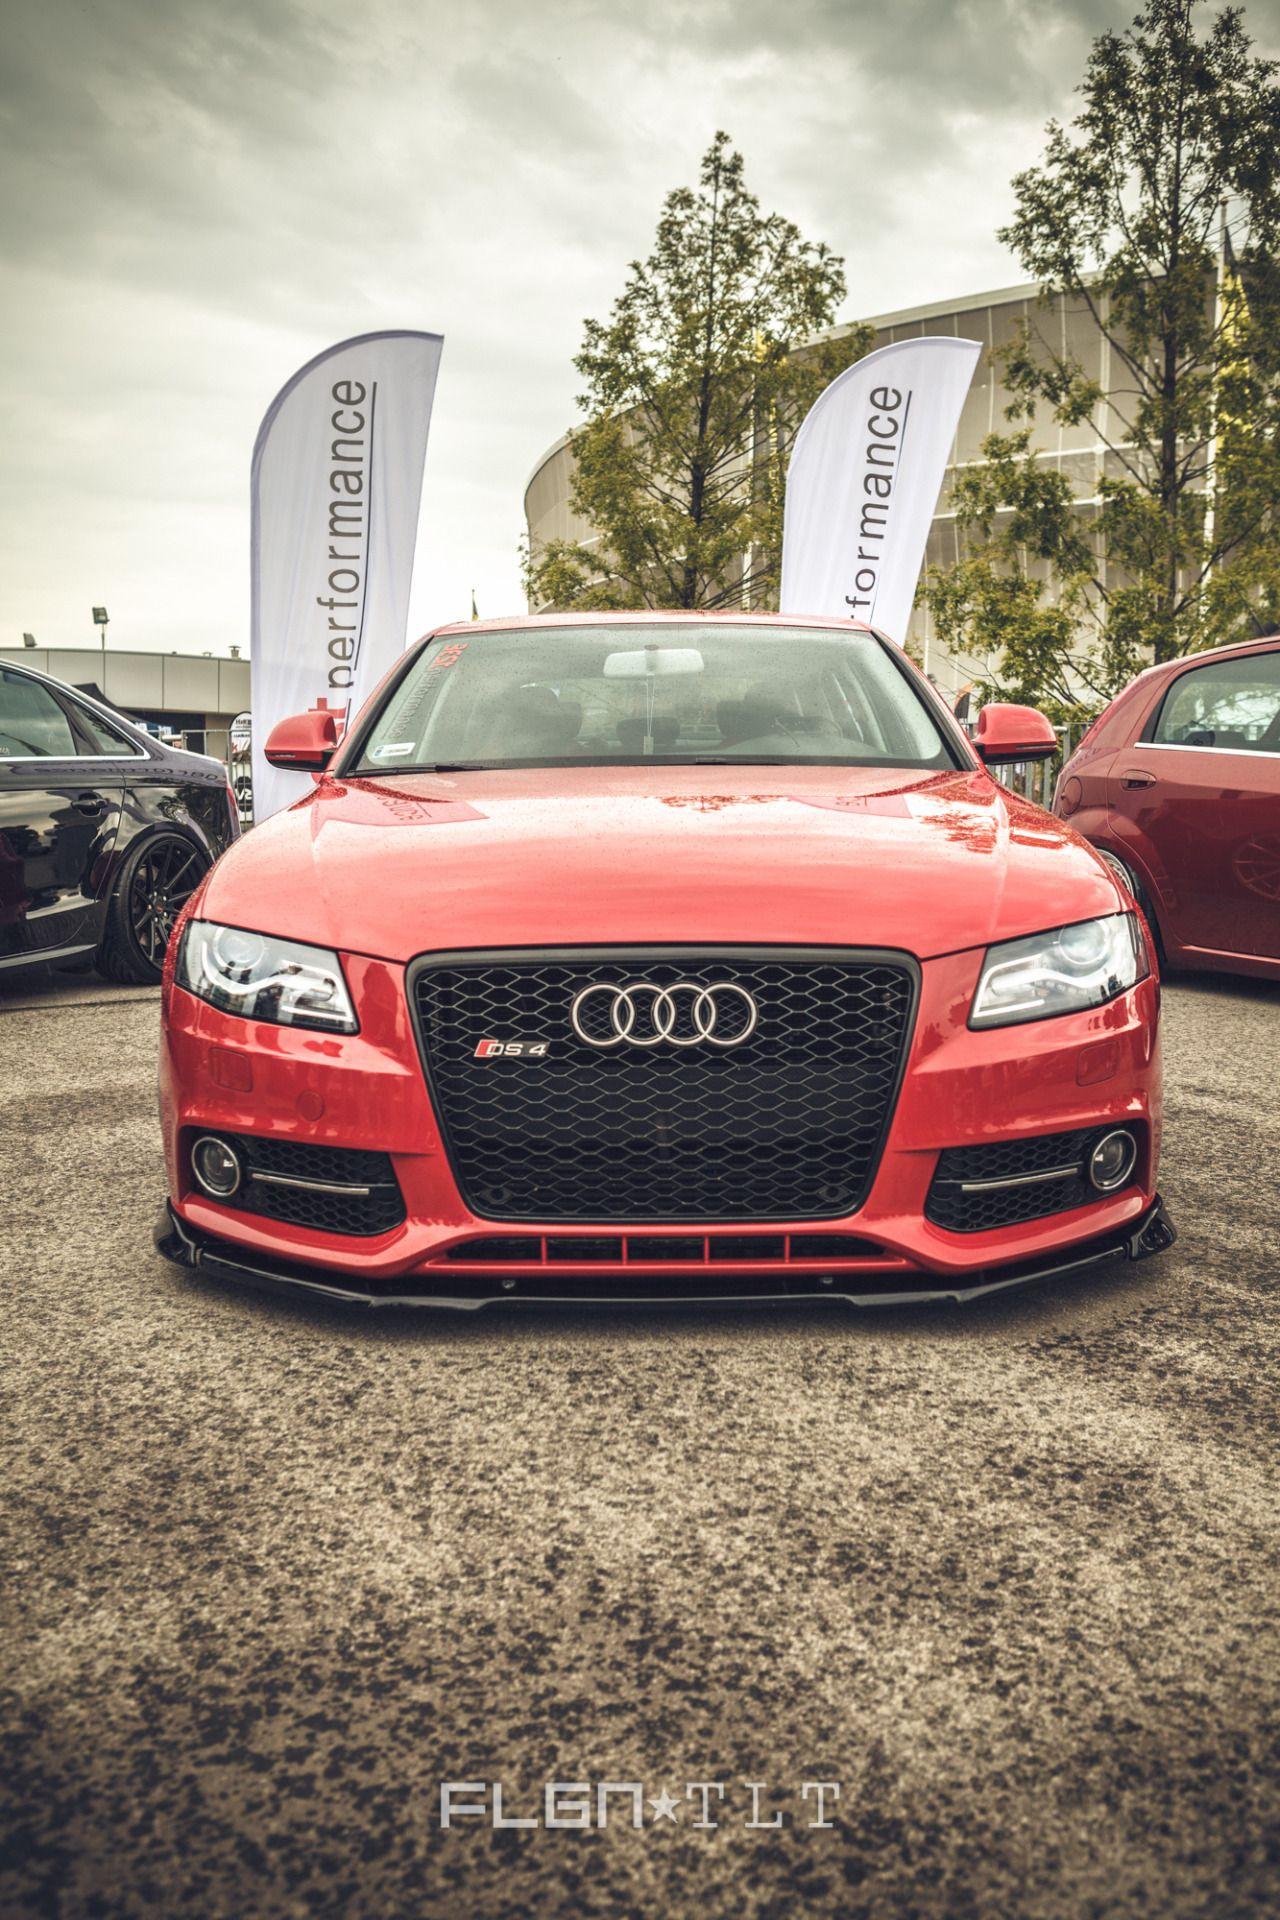 Pic Taken By FLGNTLT Wwwflgntltcom Httpflgntlttumblrcom - Audi tumblr